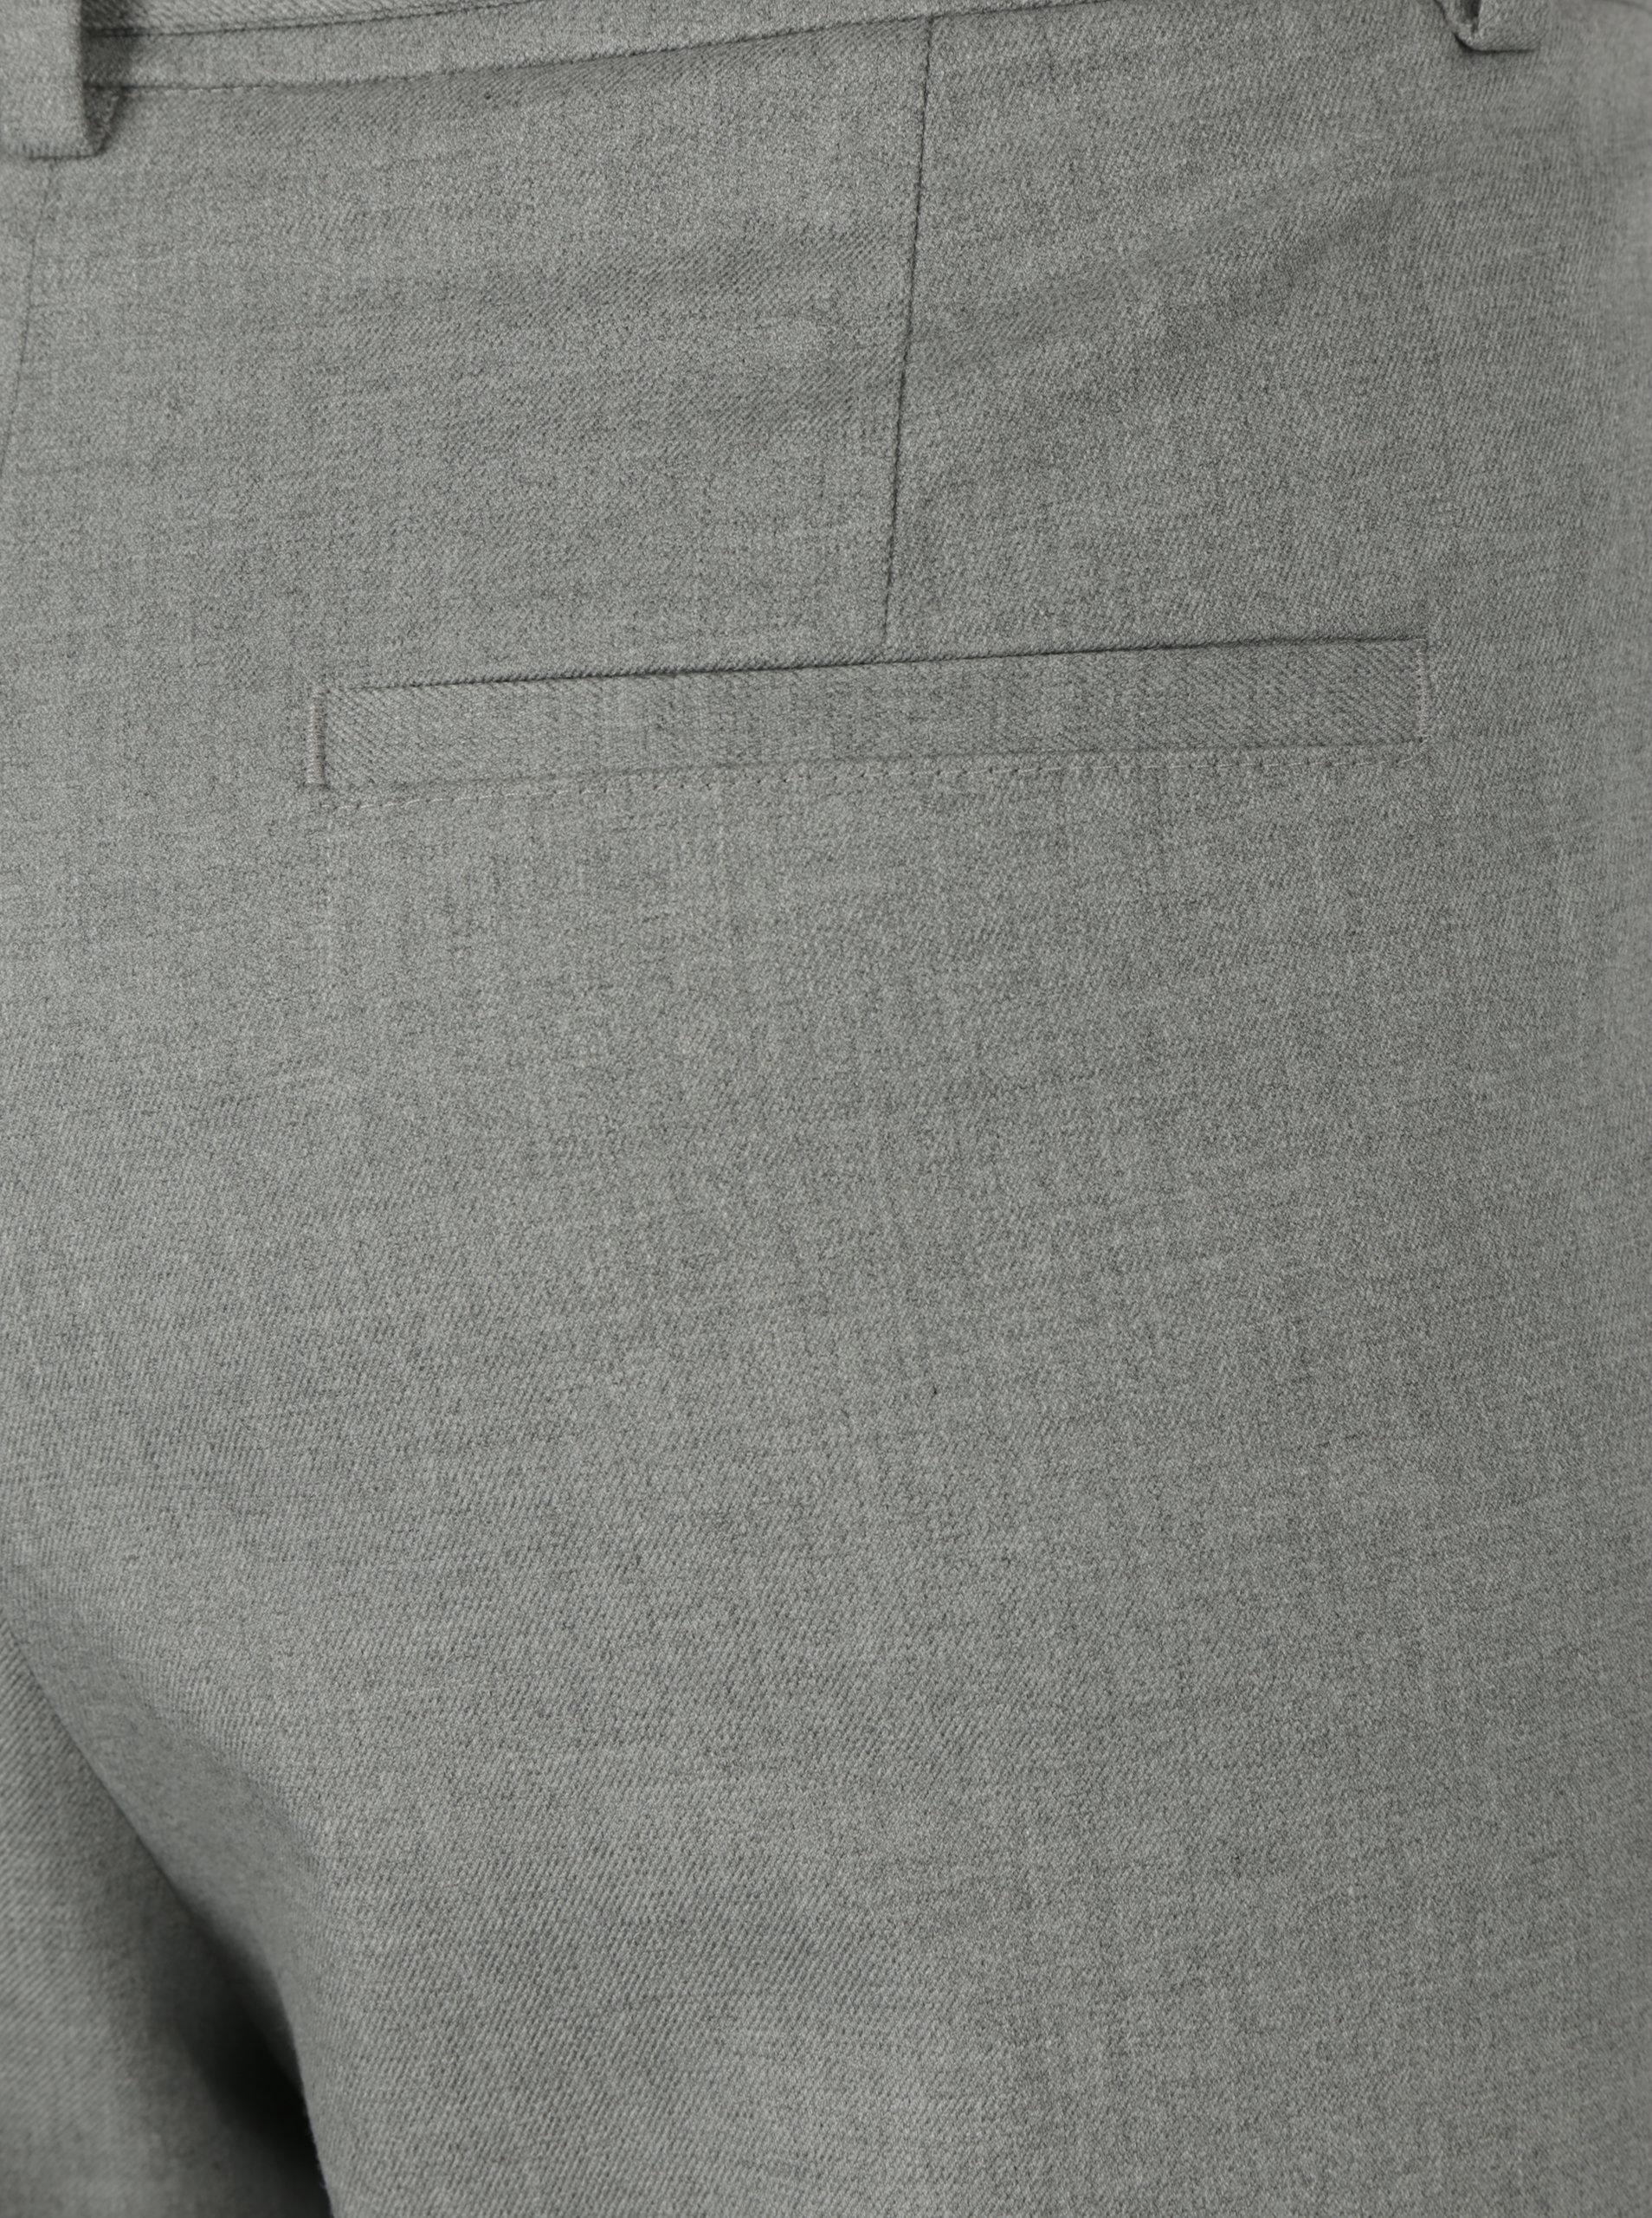 de0540b1a5c0 Svetlosivé dámske nohavice s opaskom s.Oliver